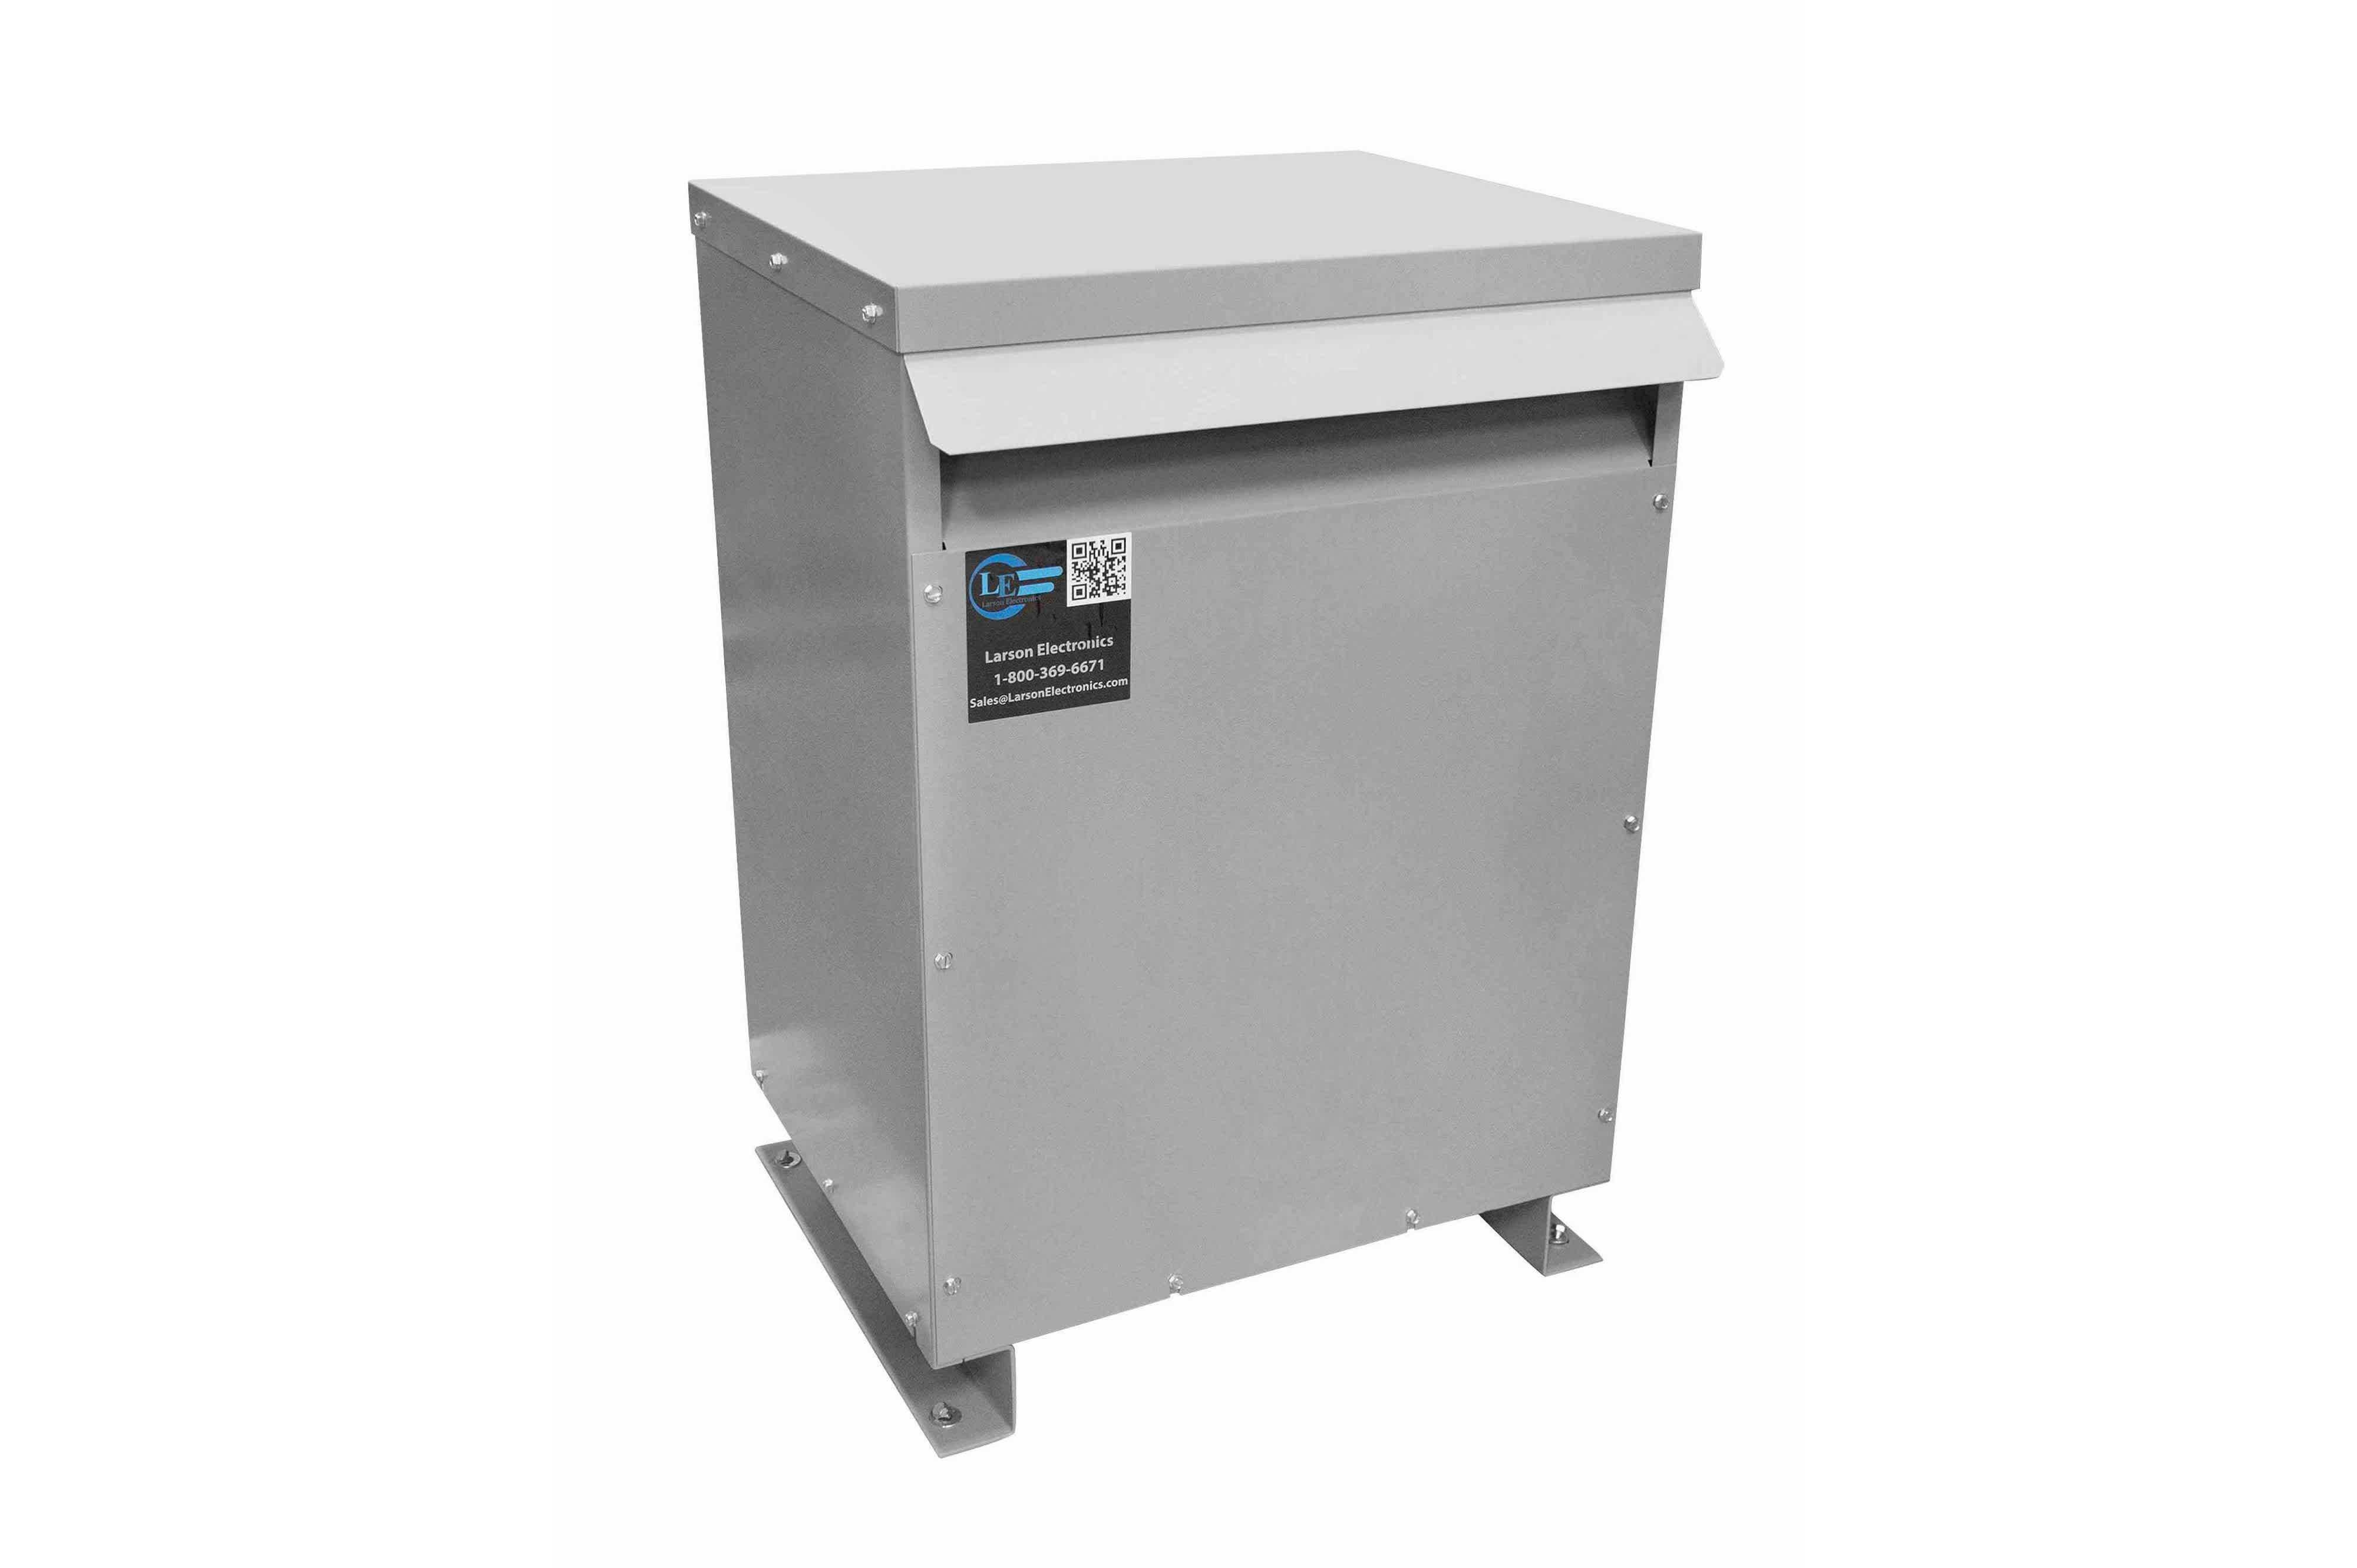 100 kVA 3PH Isolation Transformer, 208V Wye Primary, 415Y/240 Wye-N Secondary, N3R, Ventilated, 60 Hz